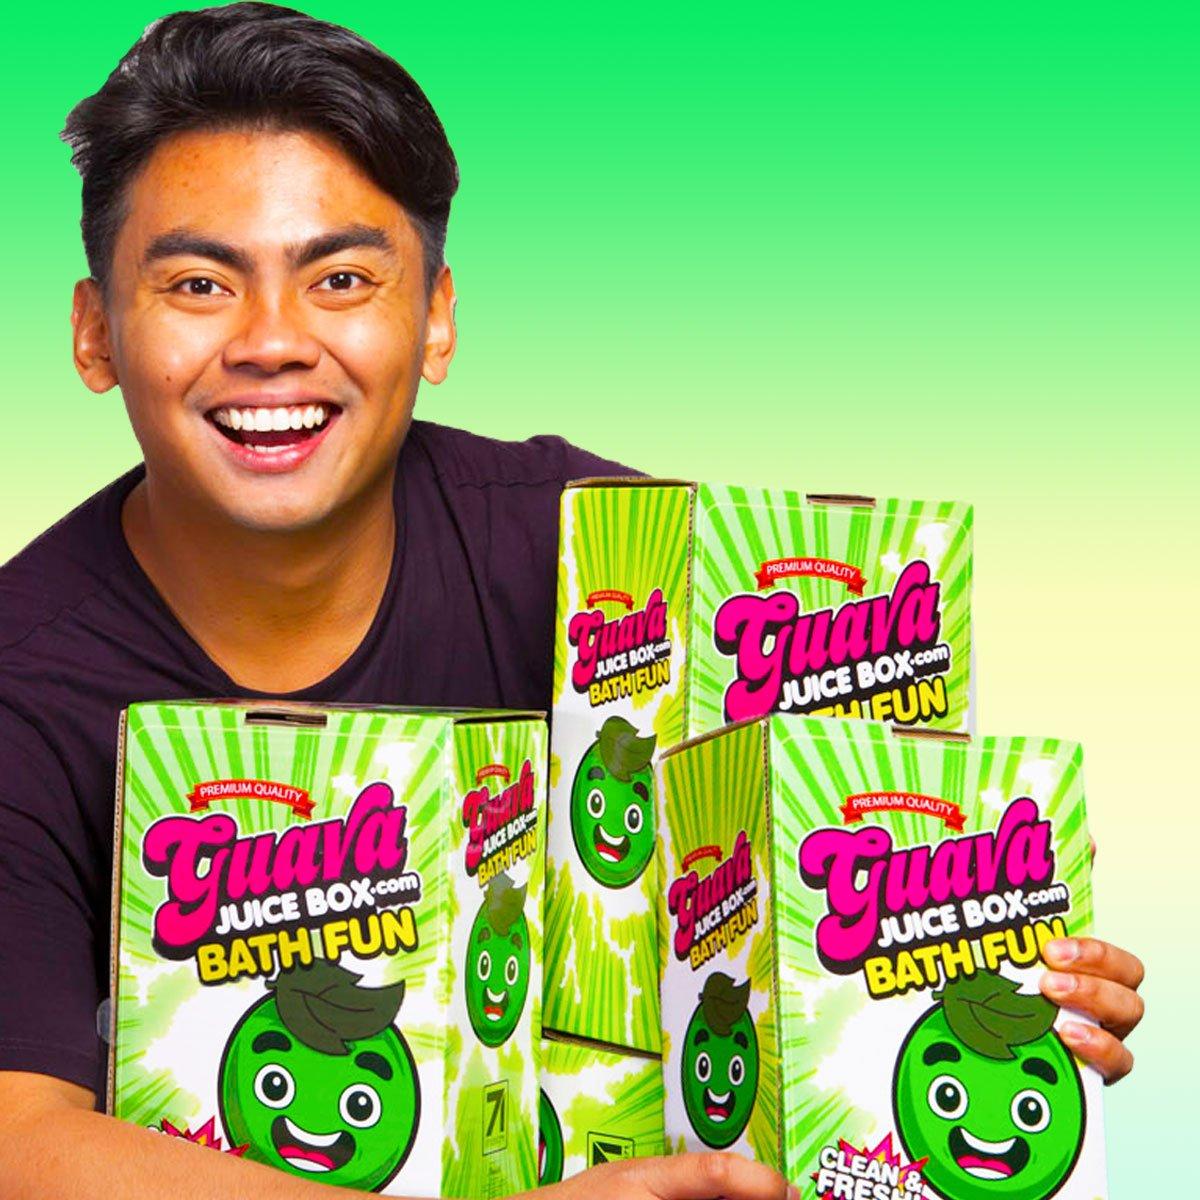 Guava Juice Box Bath Fun Kit Studio71